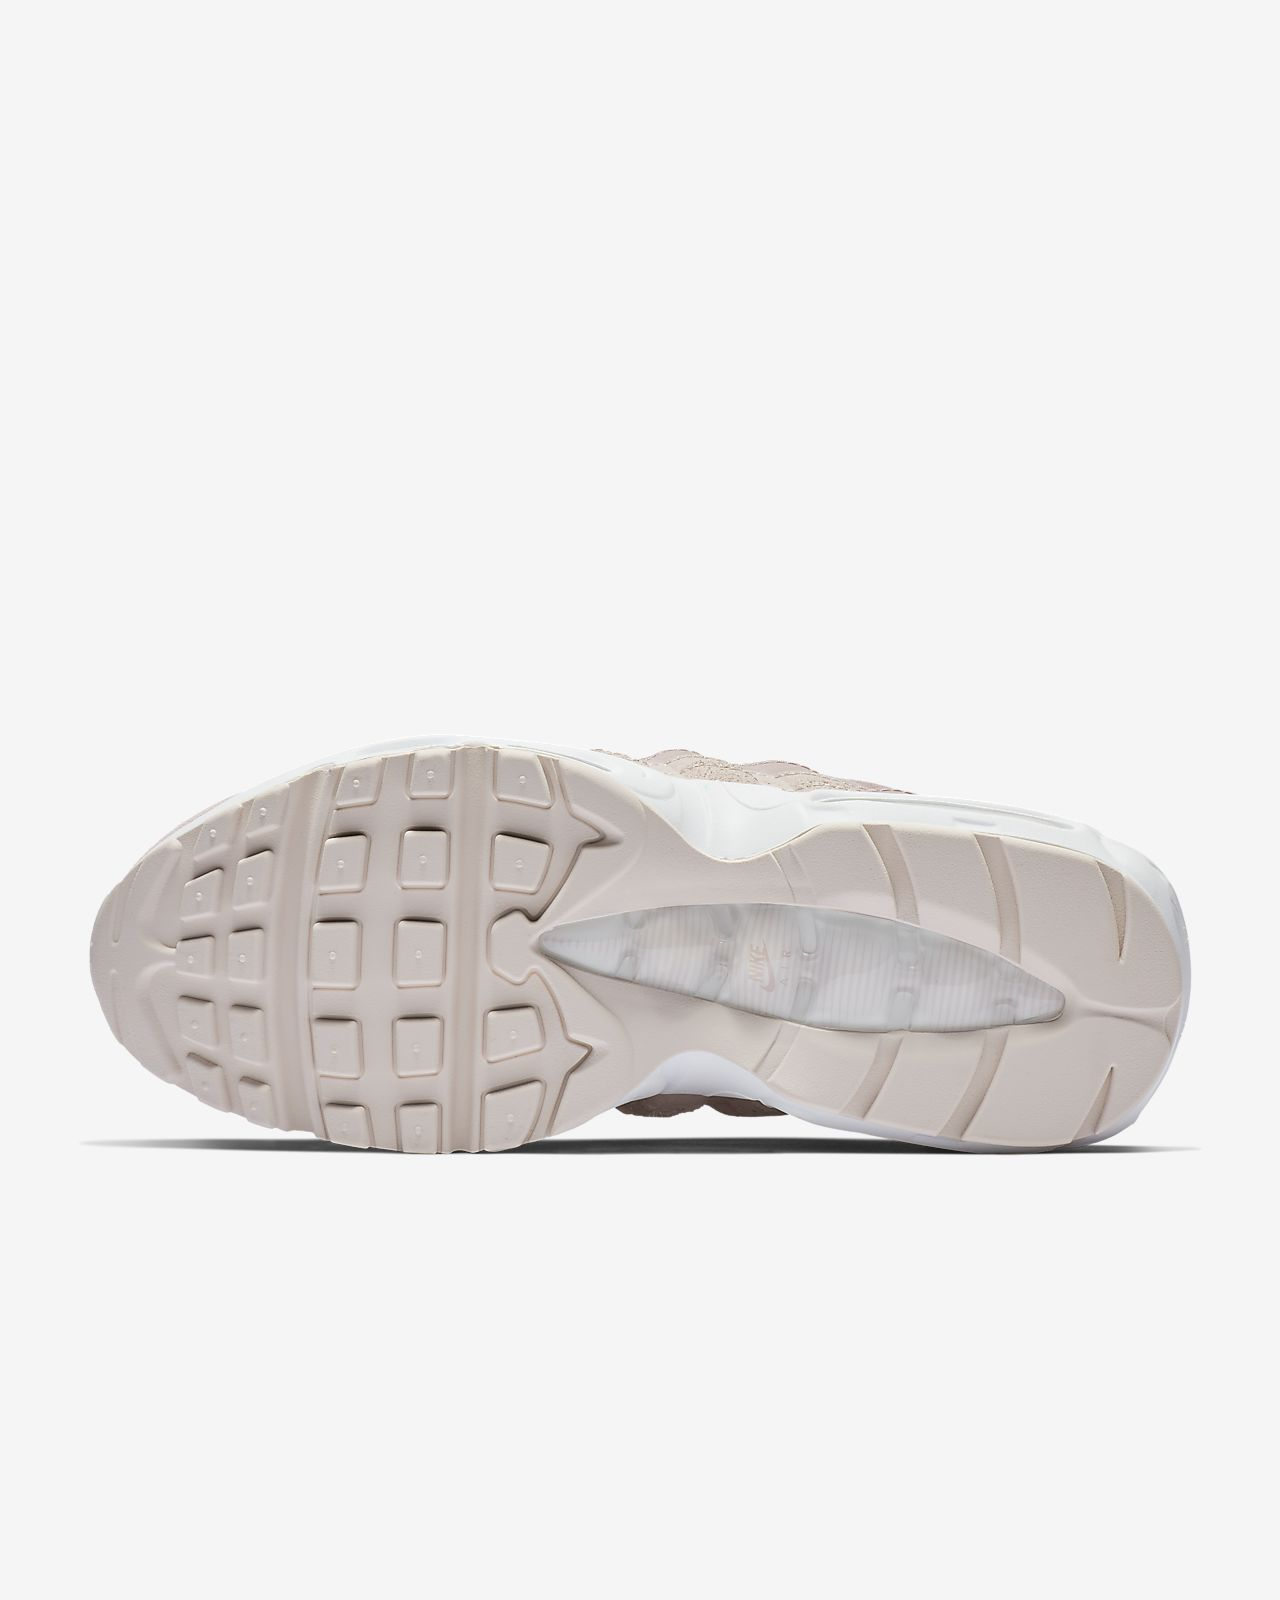 online retailer 298a3 cff21 ... Chaussure Nike Air Max 95 Premium pour Femme